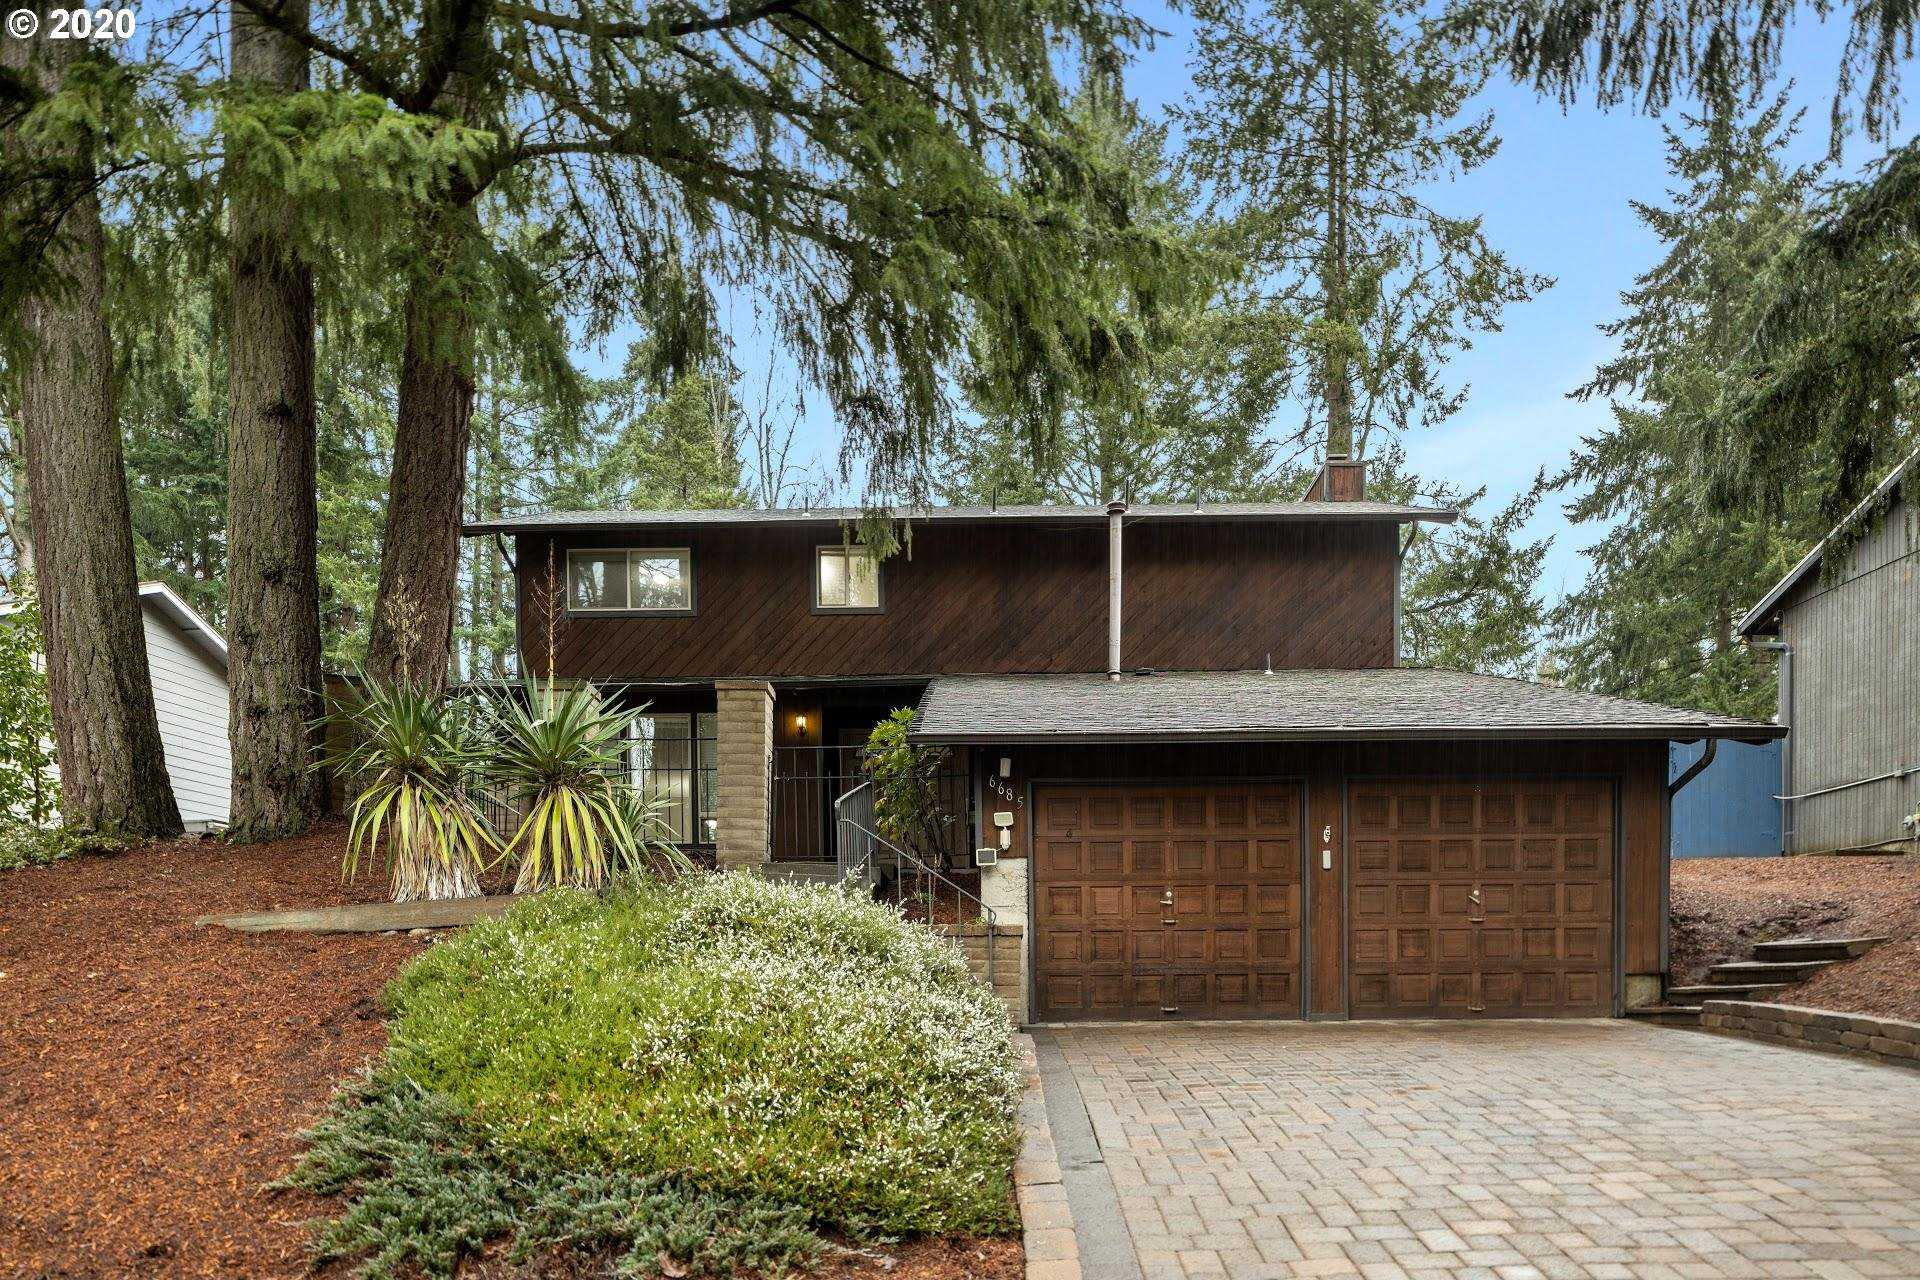 $490,000 - 4Br/3Ba -  for Sale in Beaverton